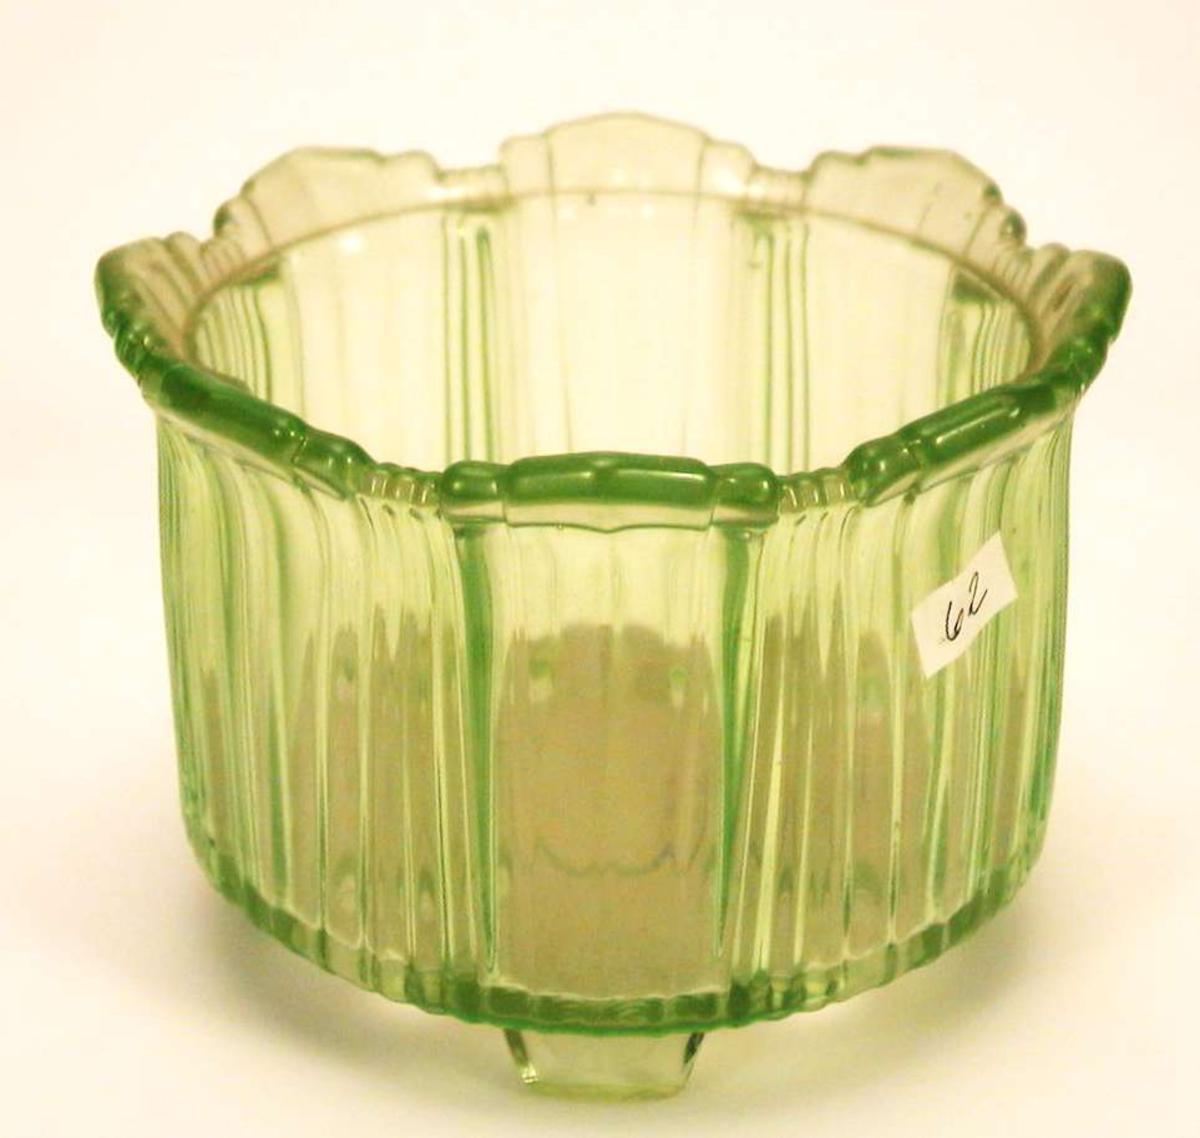 Blomsterpotteskjuler i grønt glass.